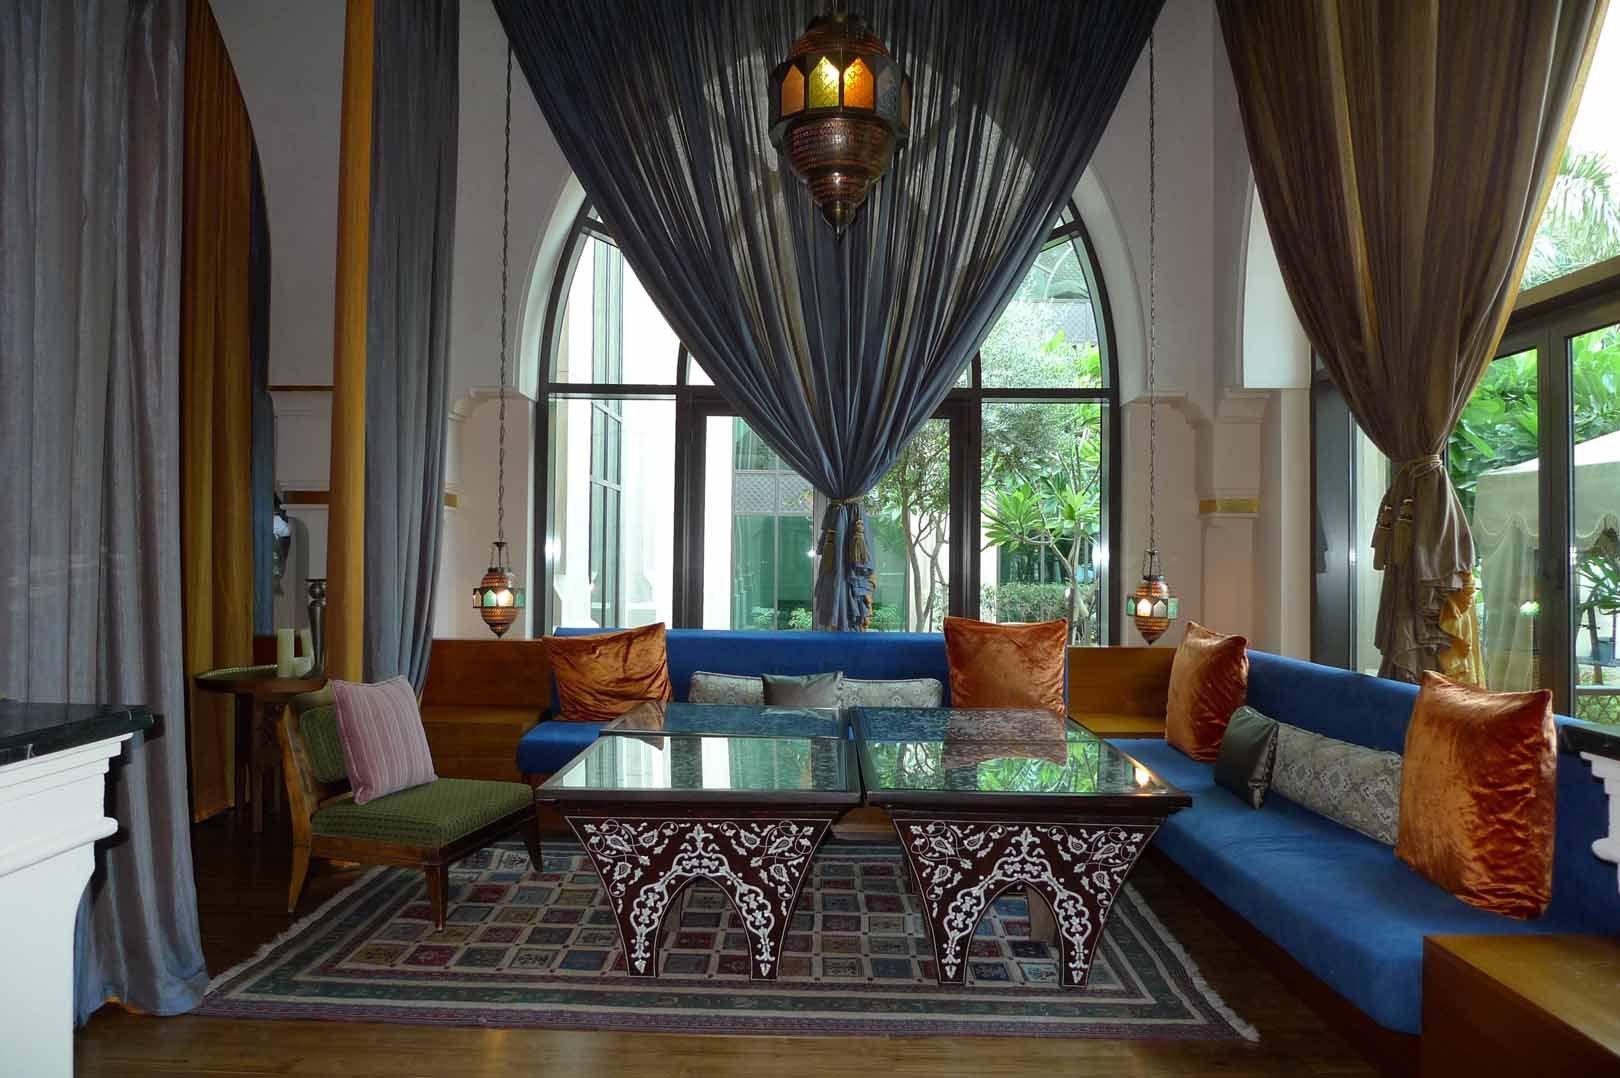 Palace-Downtown-Dubai_Slideshow_005